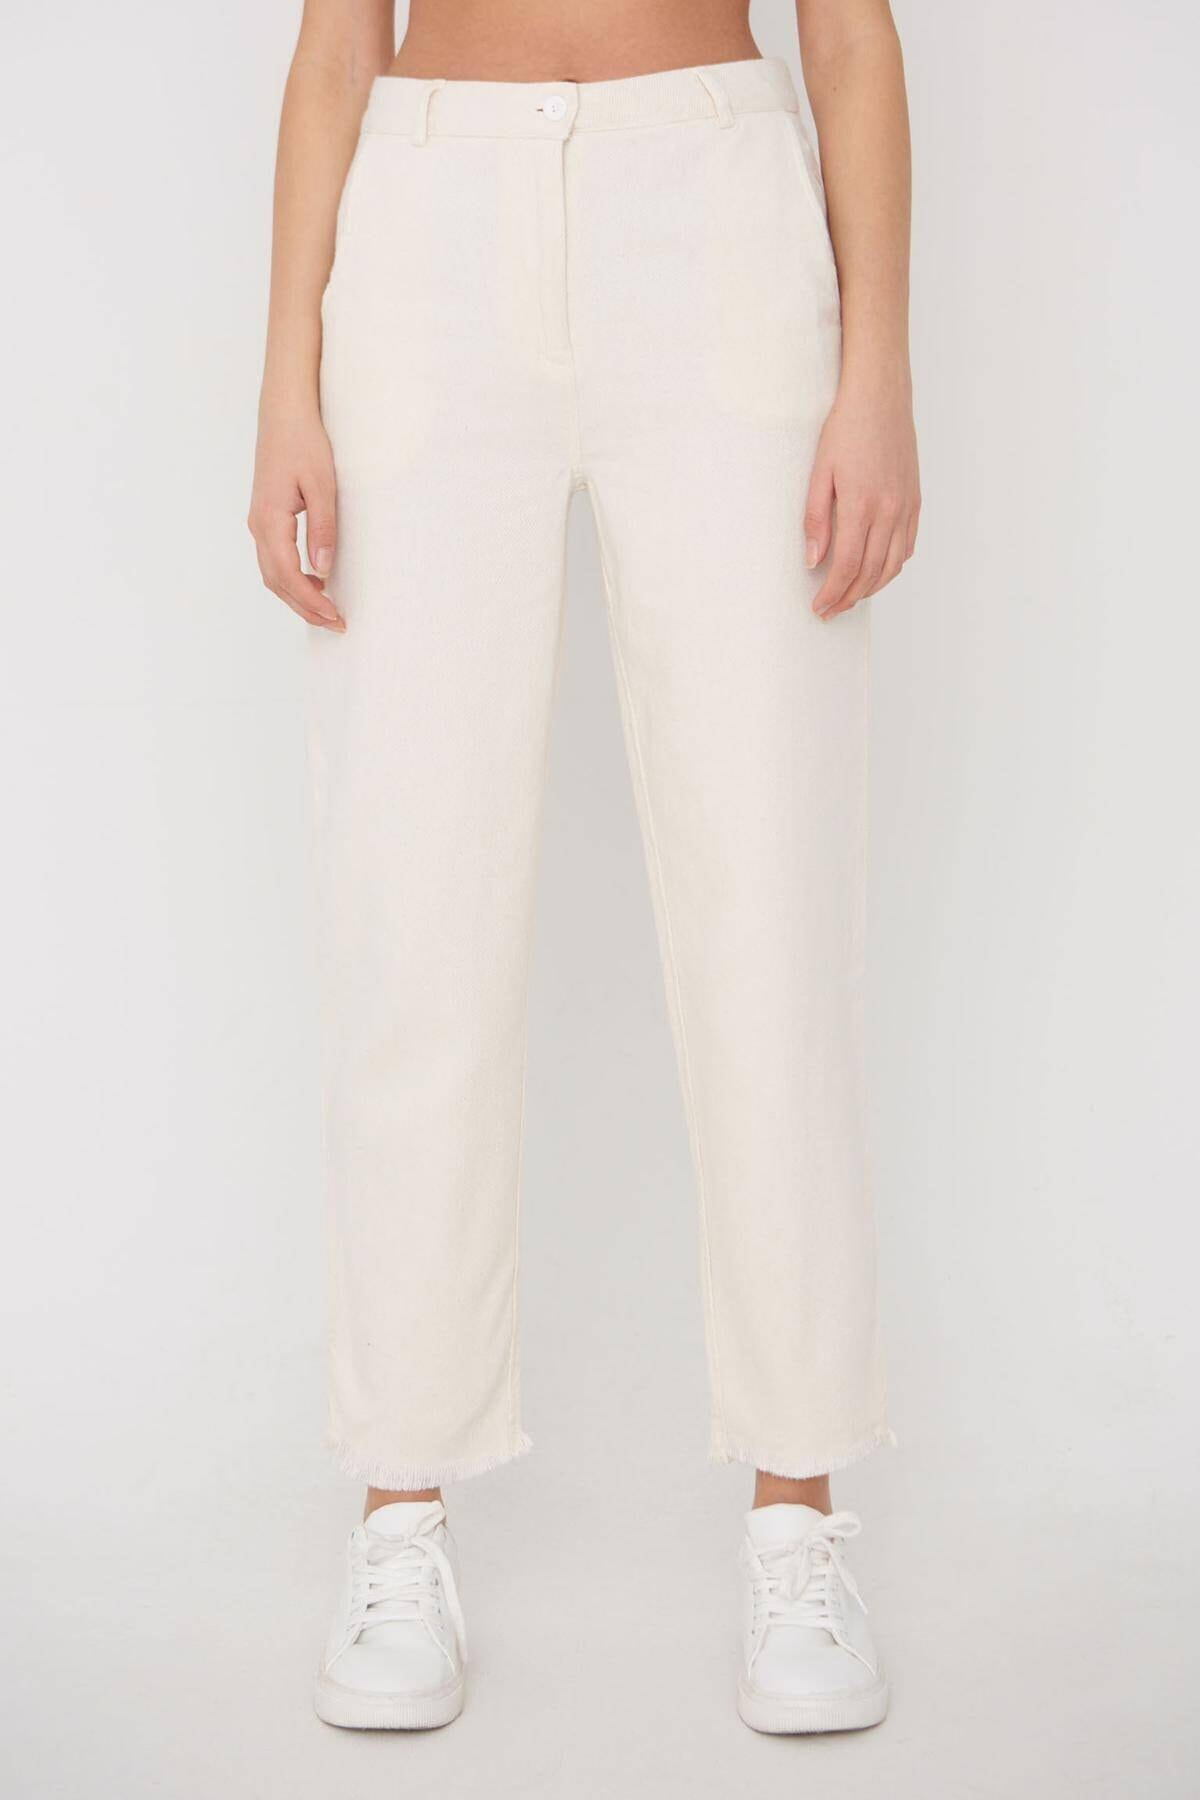 Addax Kadın Ham Paça Detaylı Pantolon Pn11-0049 - K8 Adx-0000023876 2